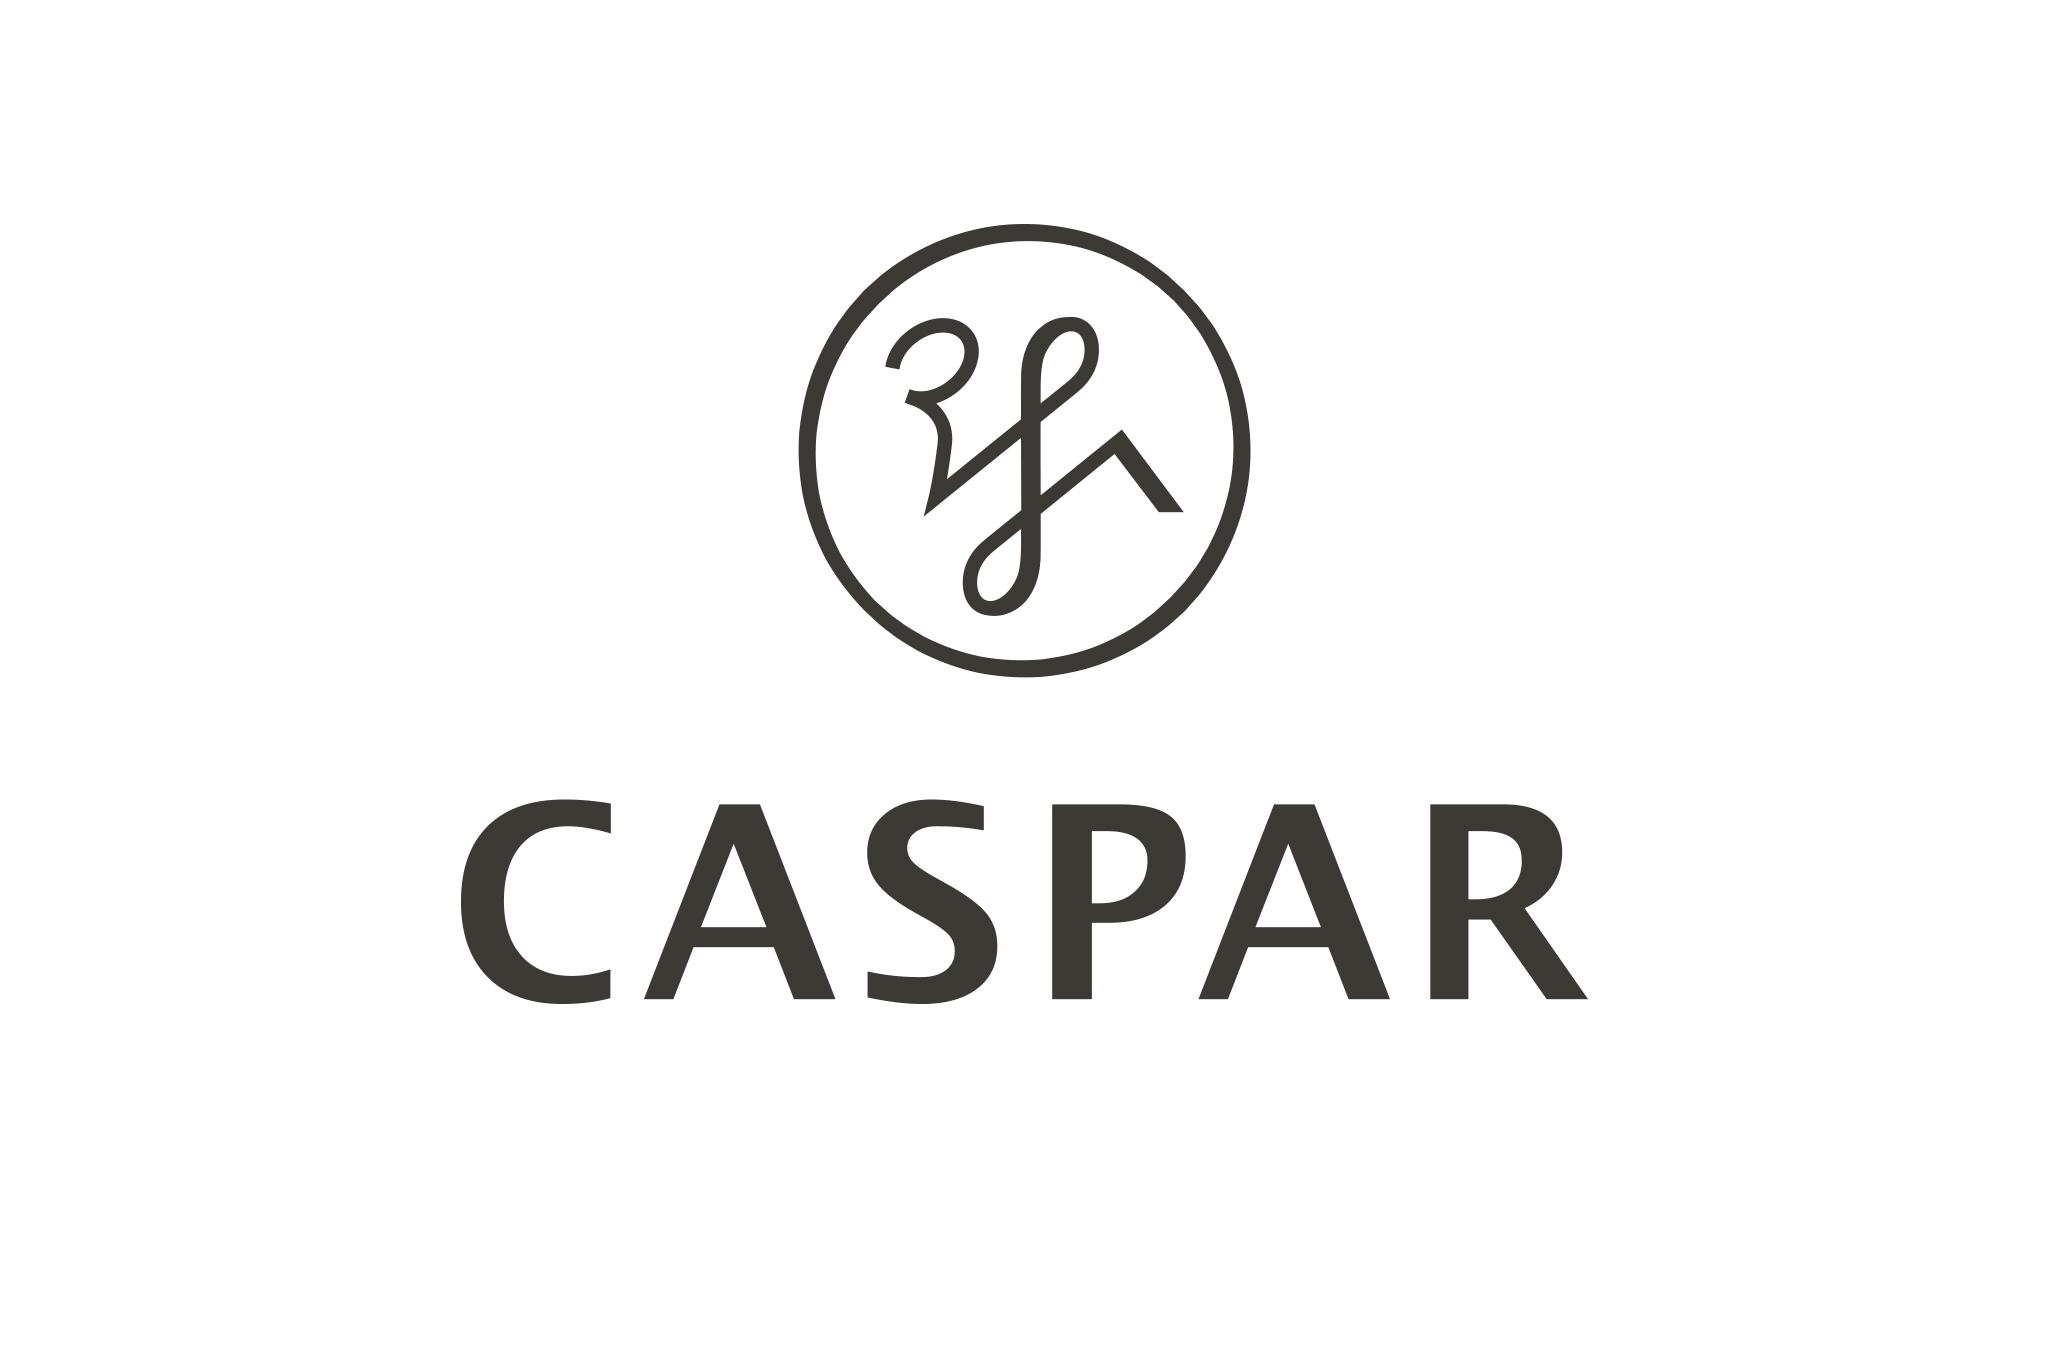 IJD_CASPAR